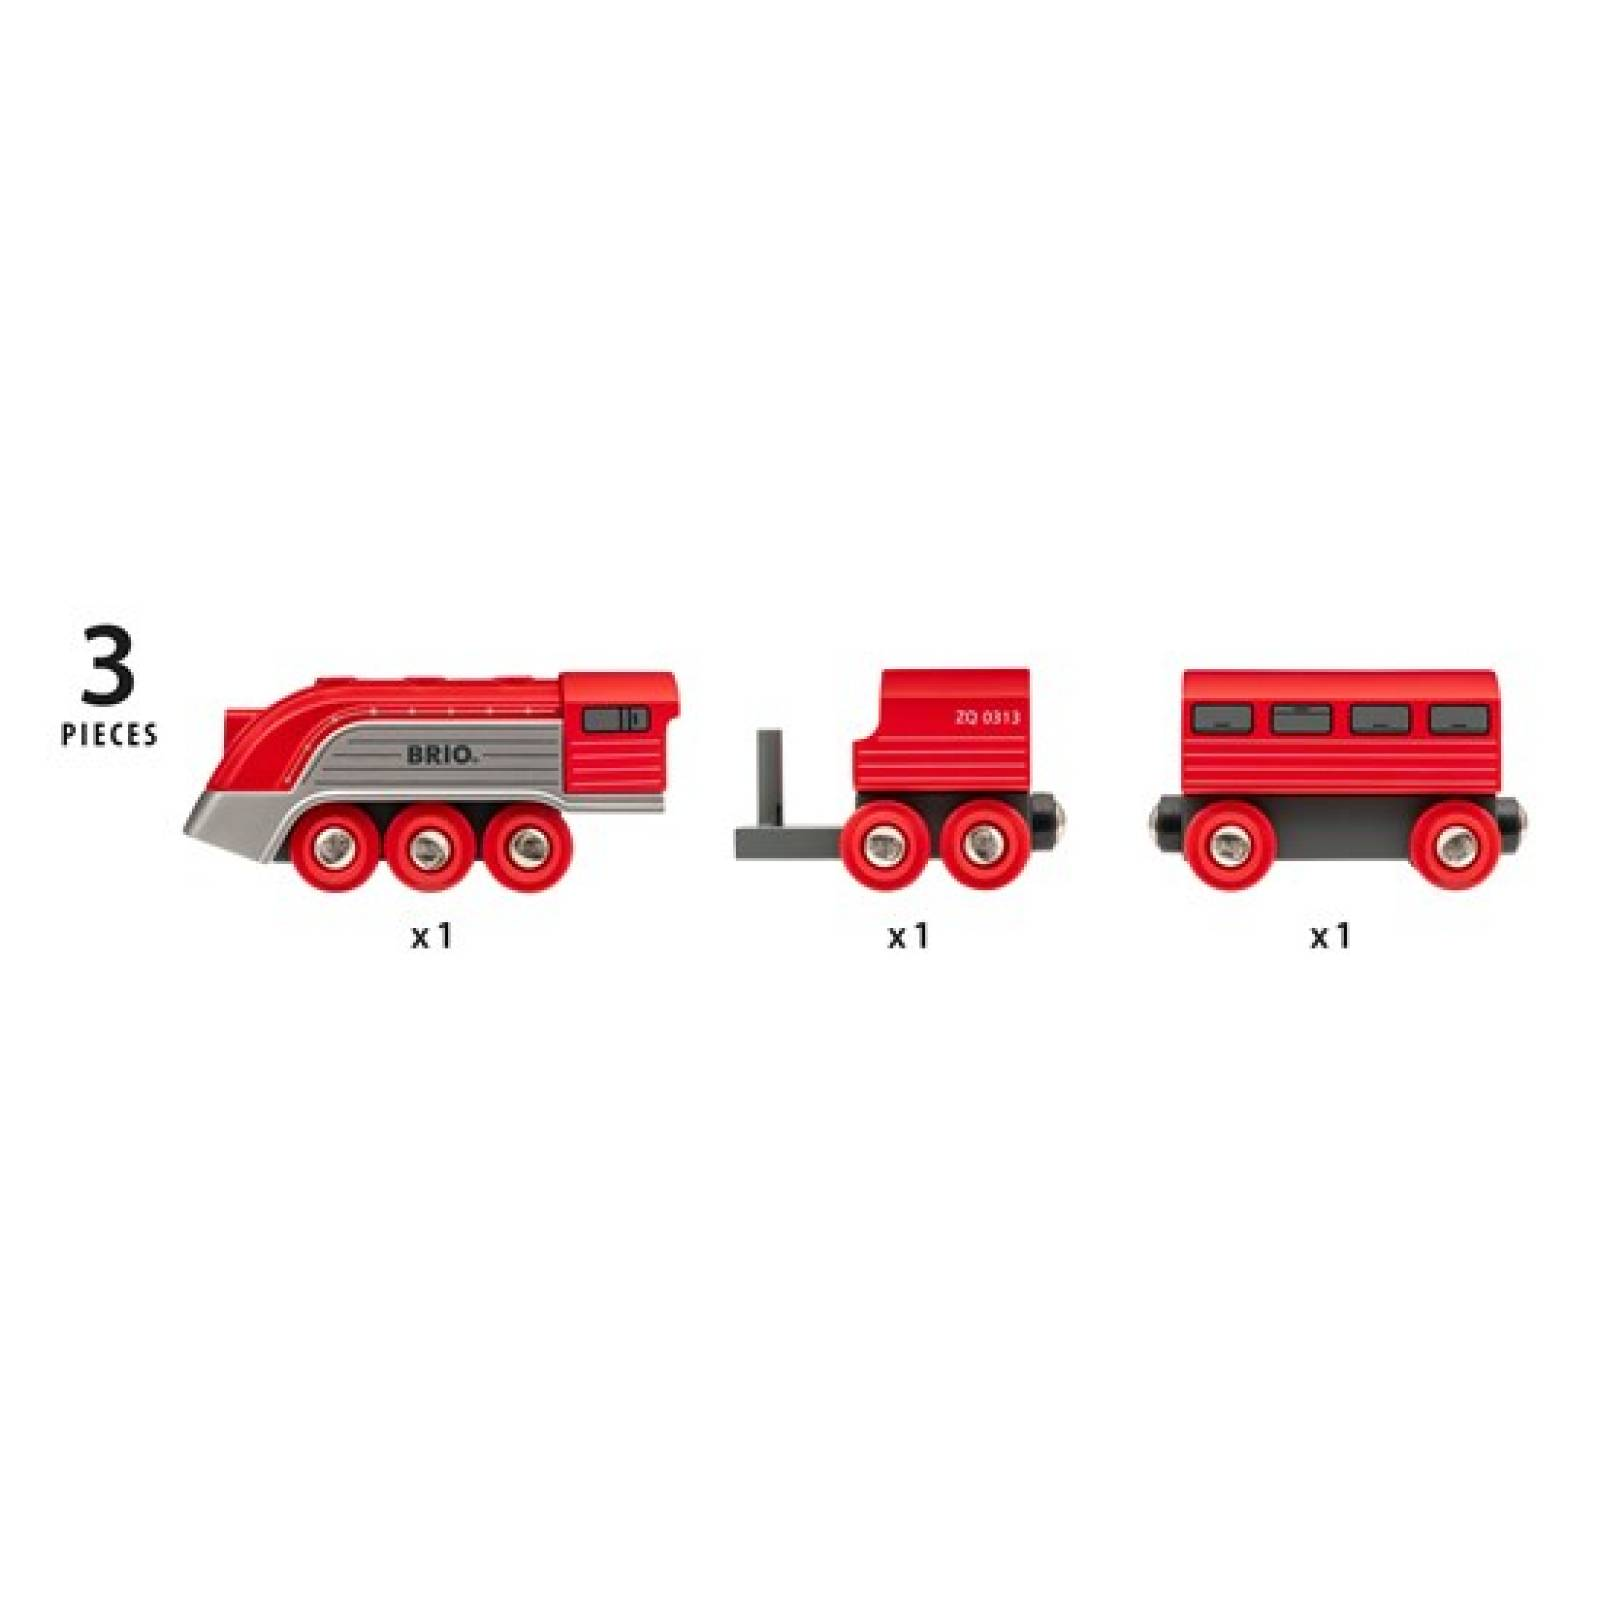 Streamline Train BRIO Wooden Railway Age 3+ thumbnails